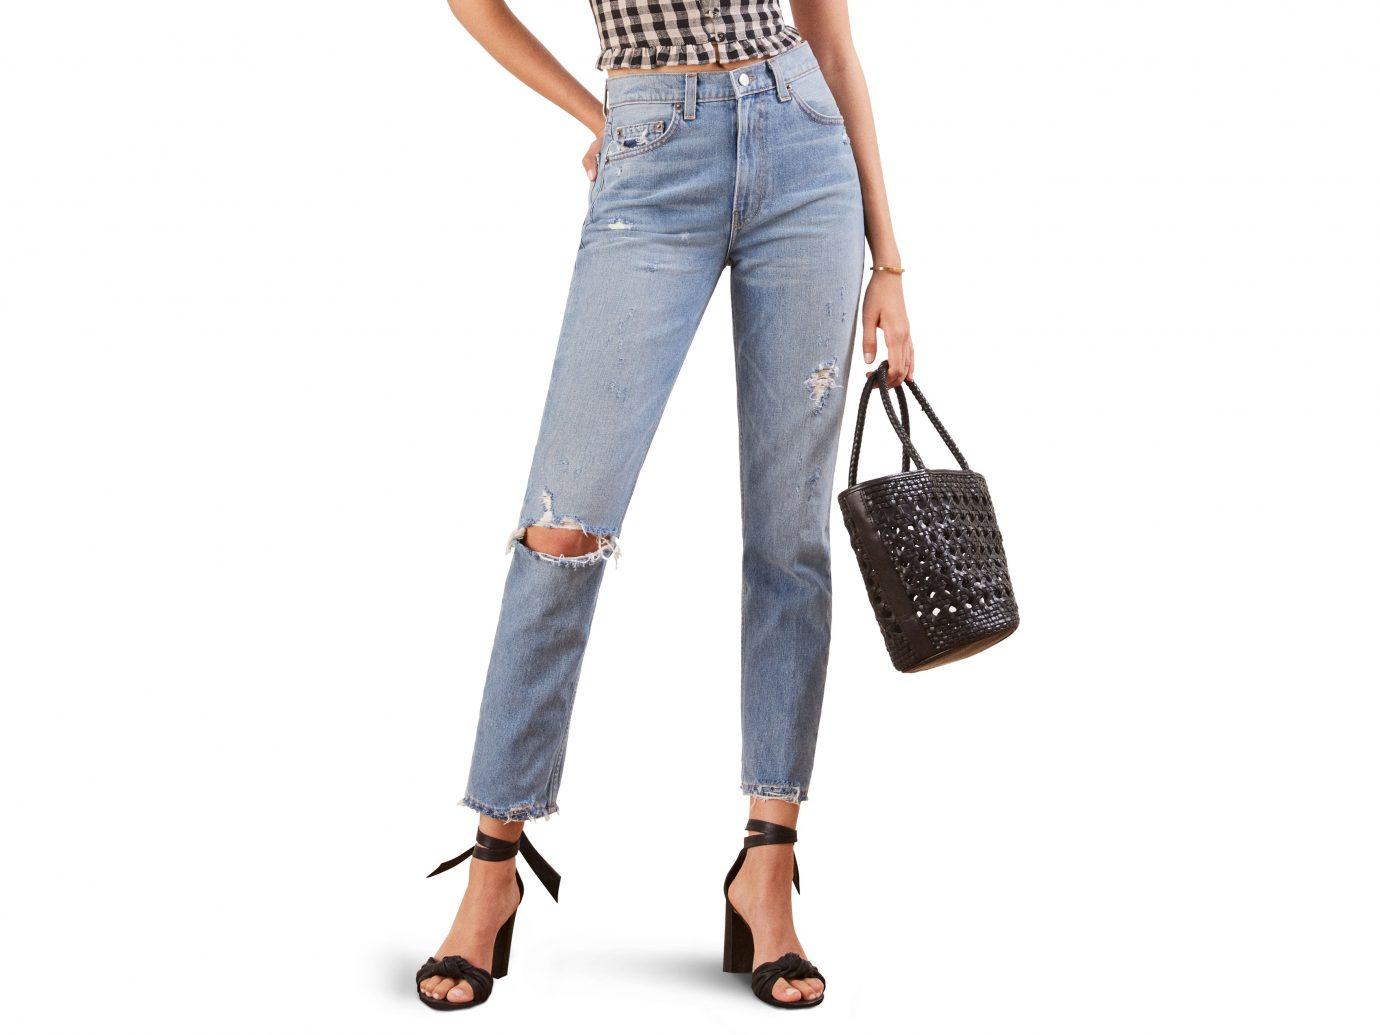 Reformation Julia High Waist Cigarette Jeans